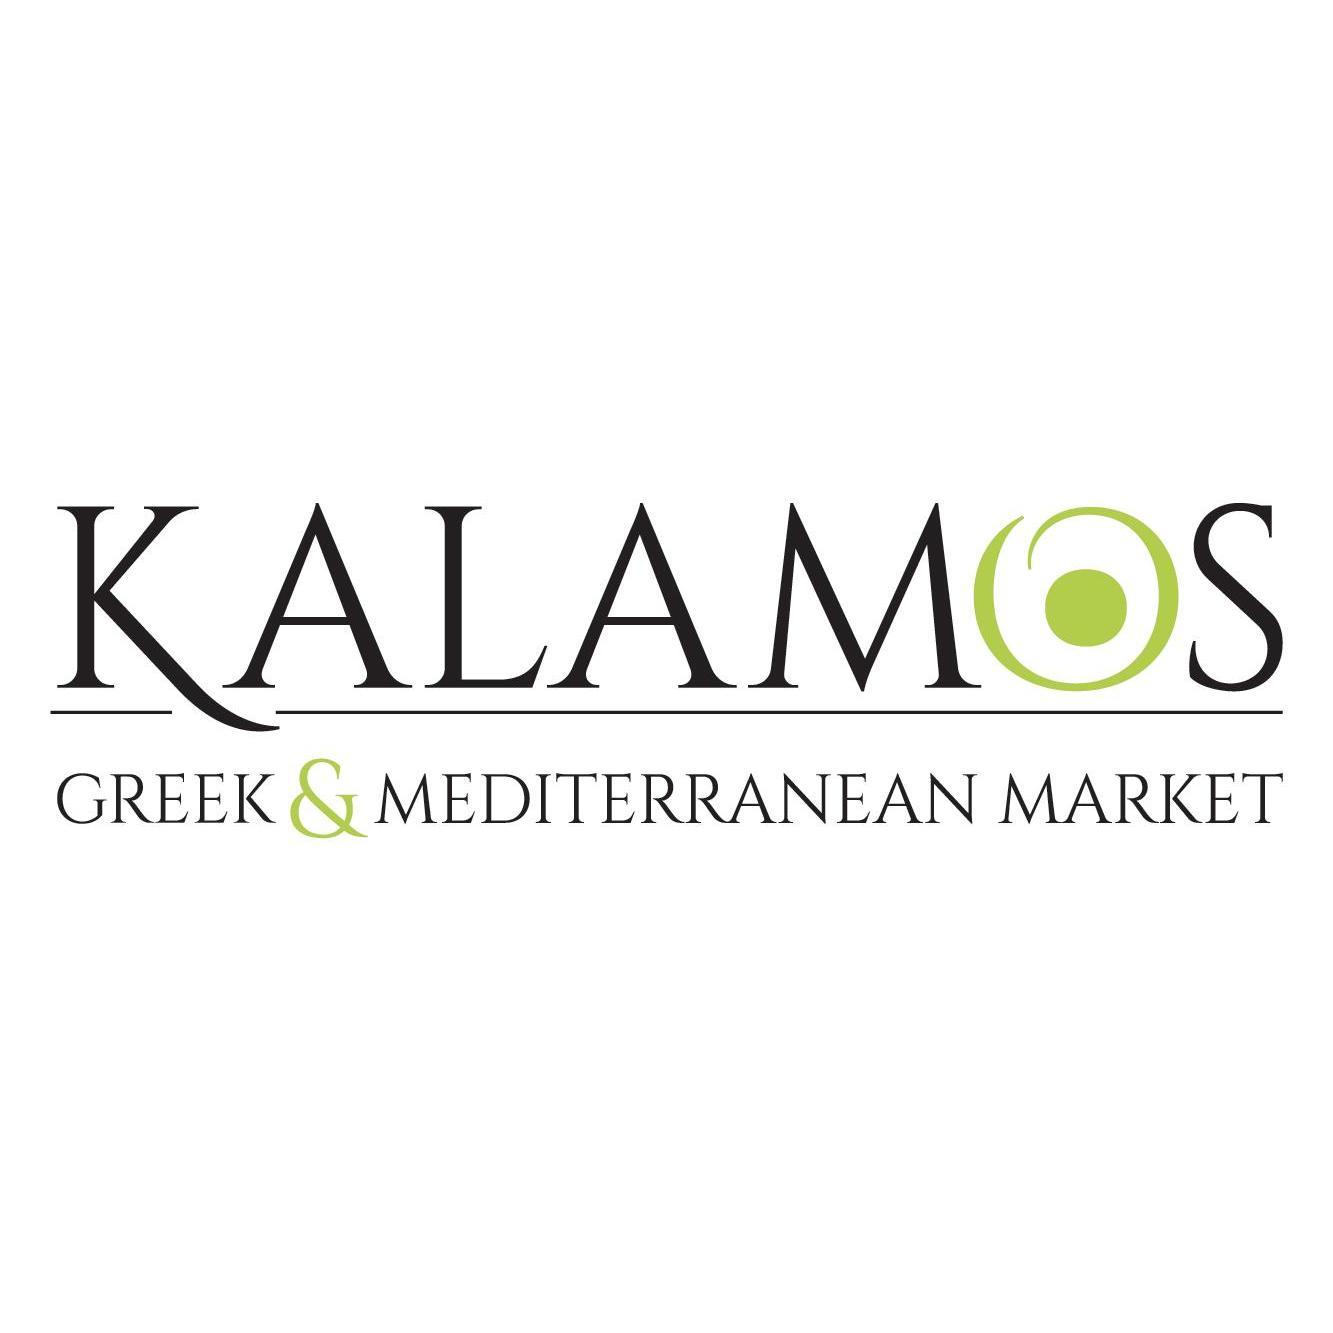 Kalamos Greek & Mediterranean Market